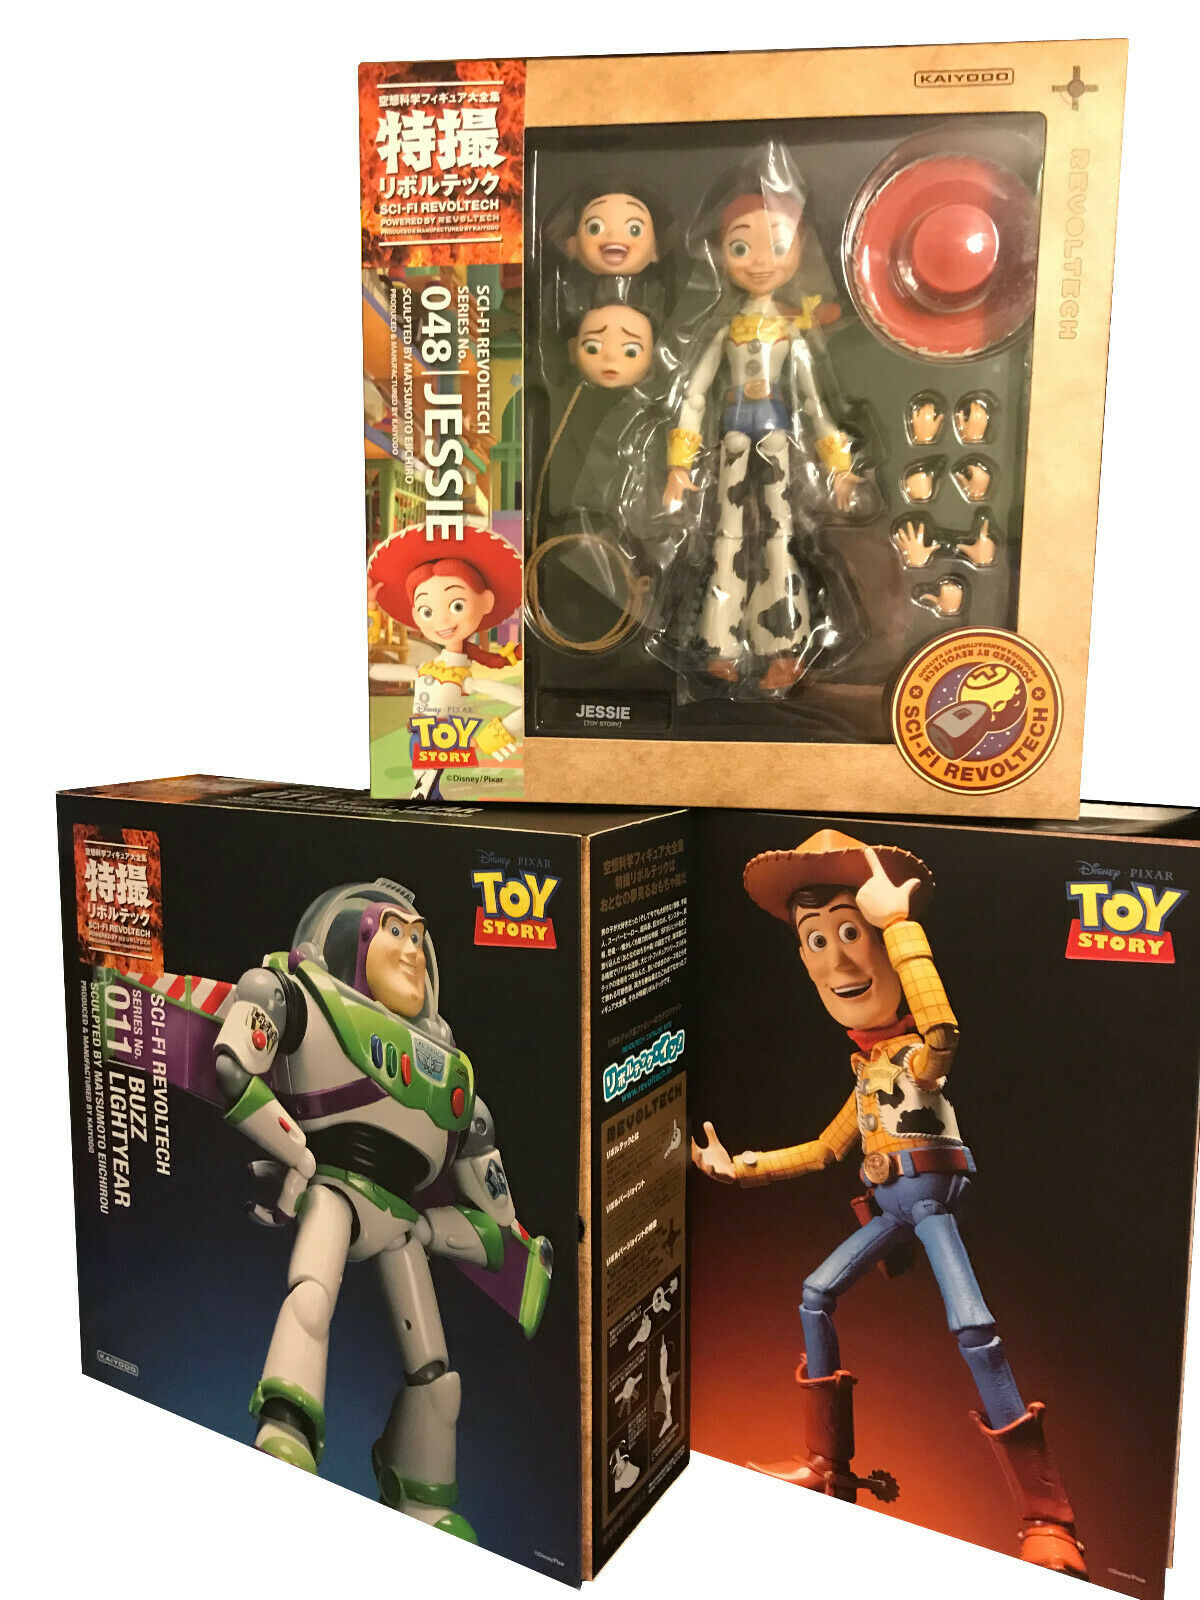 Sci-Fi Revoltech 048 011 010 Toy Story Jessie buzz lightyear Woody Action Figure